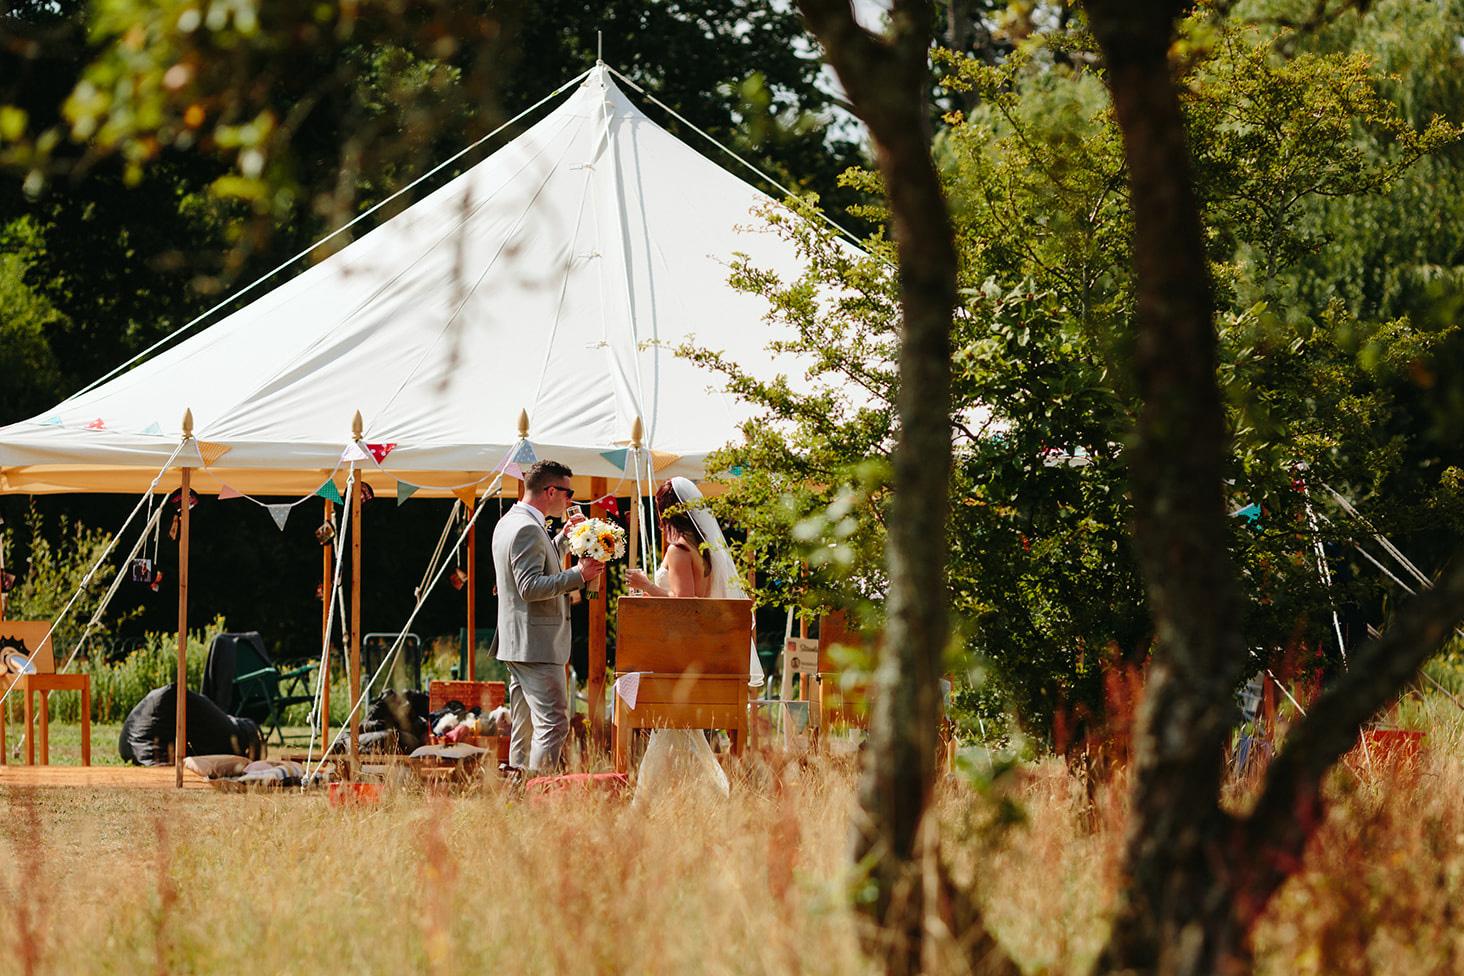 festival wedding tent